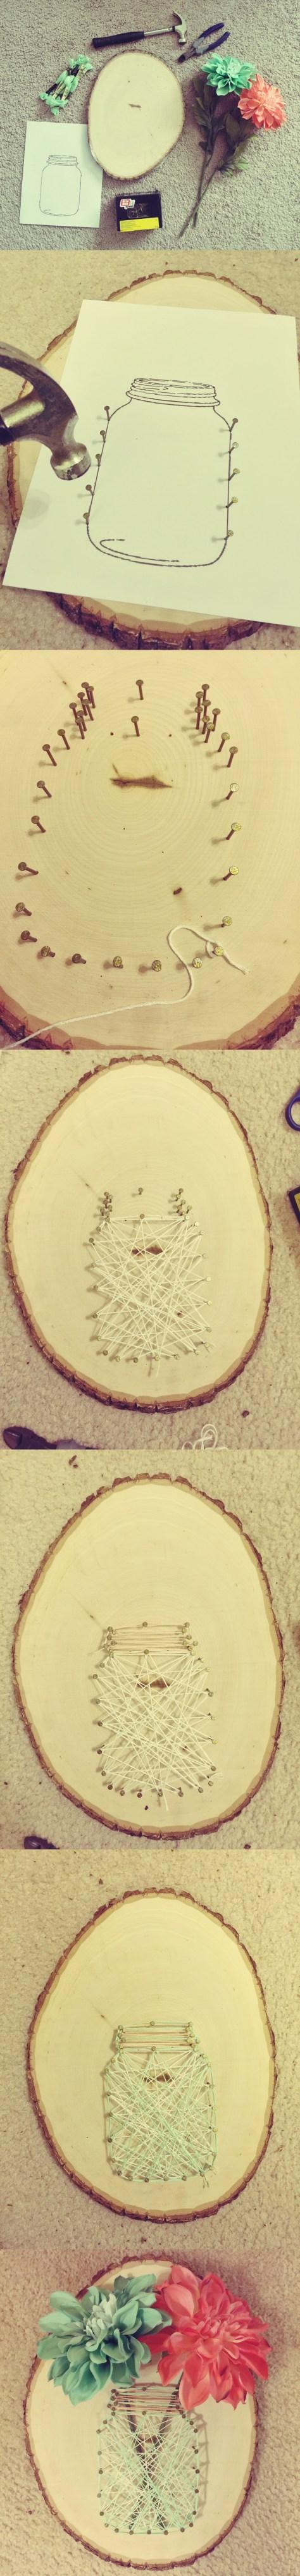 DIY Mason Jar String Art